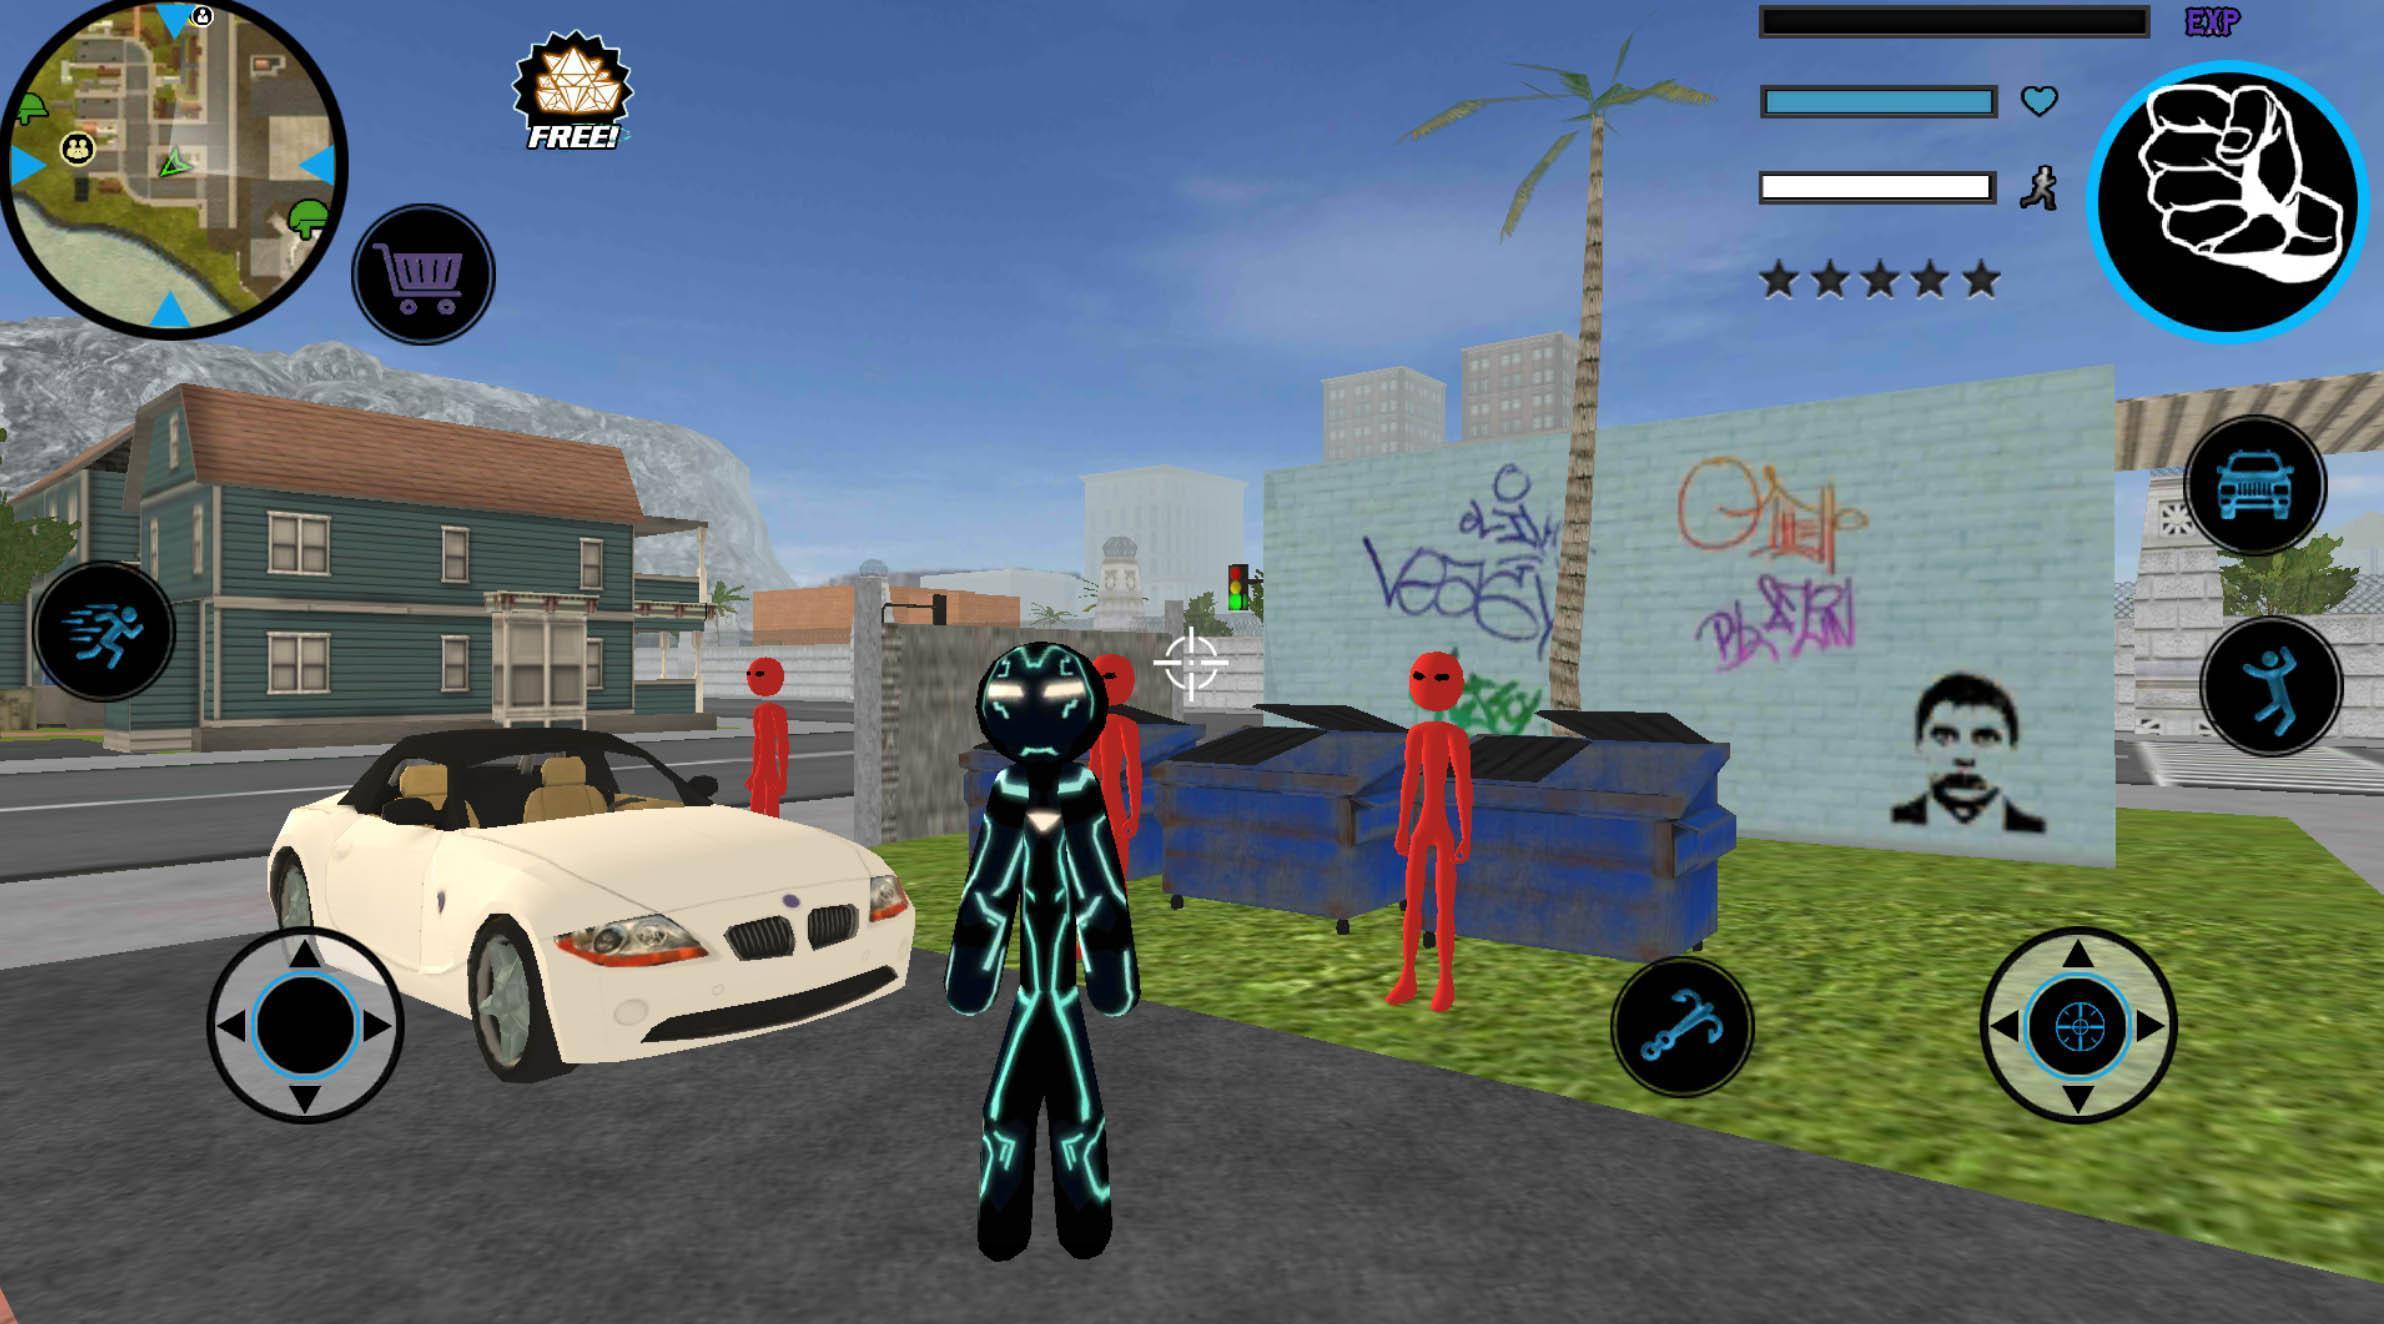 Neon Iron Stickman Rope Hero City Gangstar Mafia 1.6 Screenshot 5